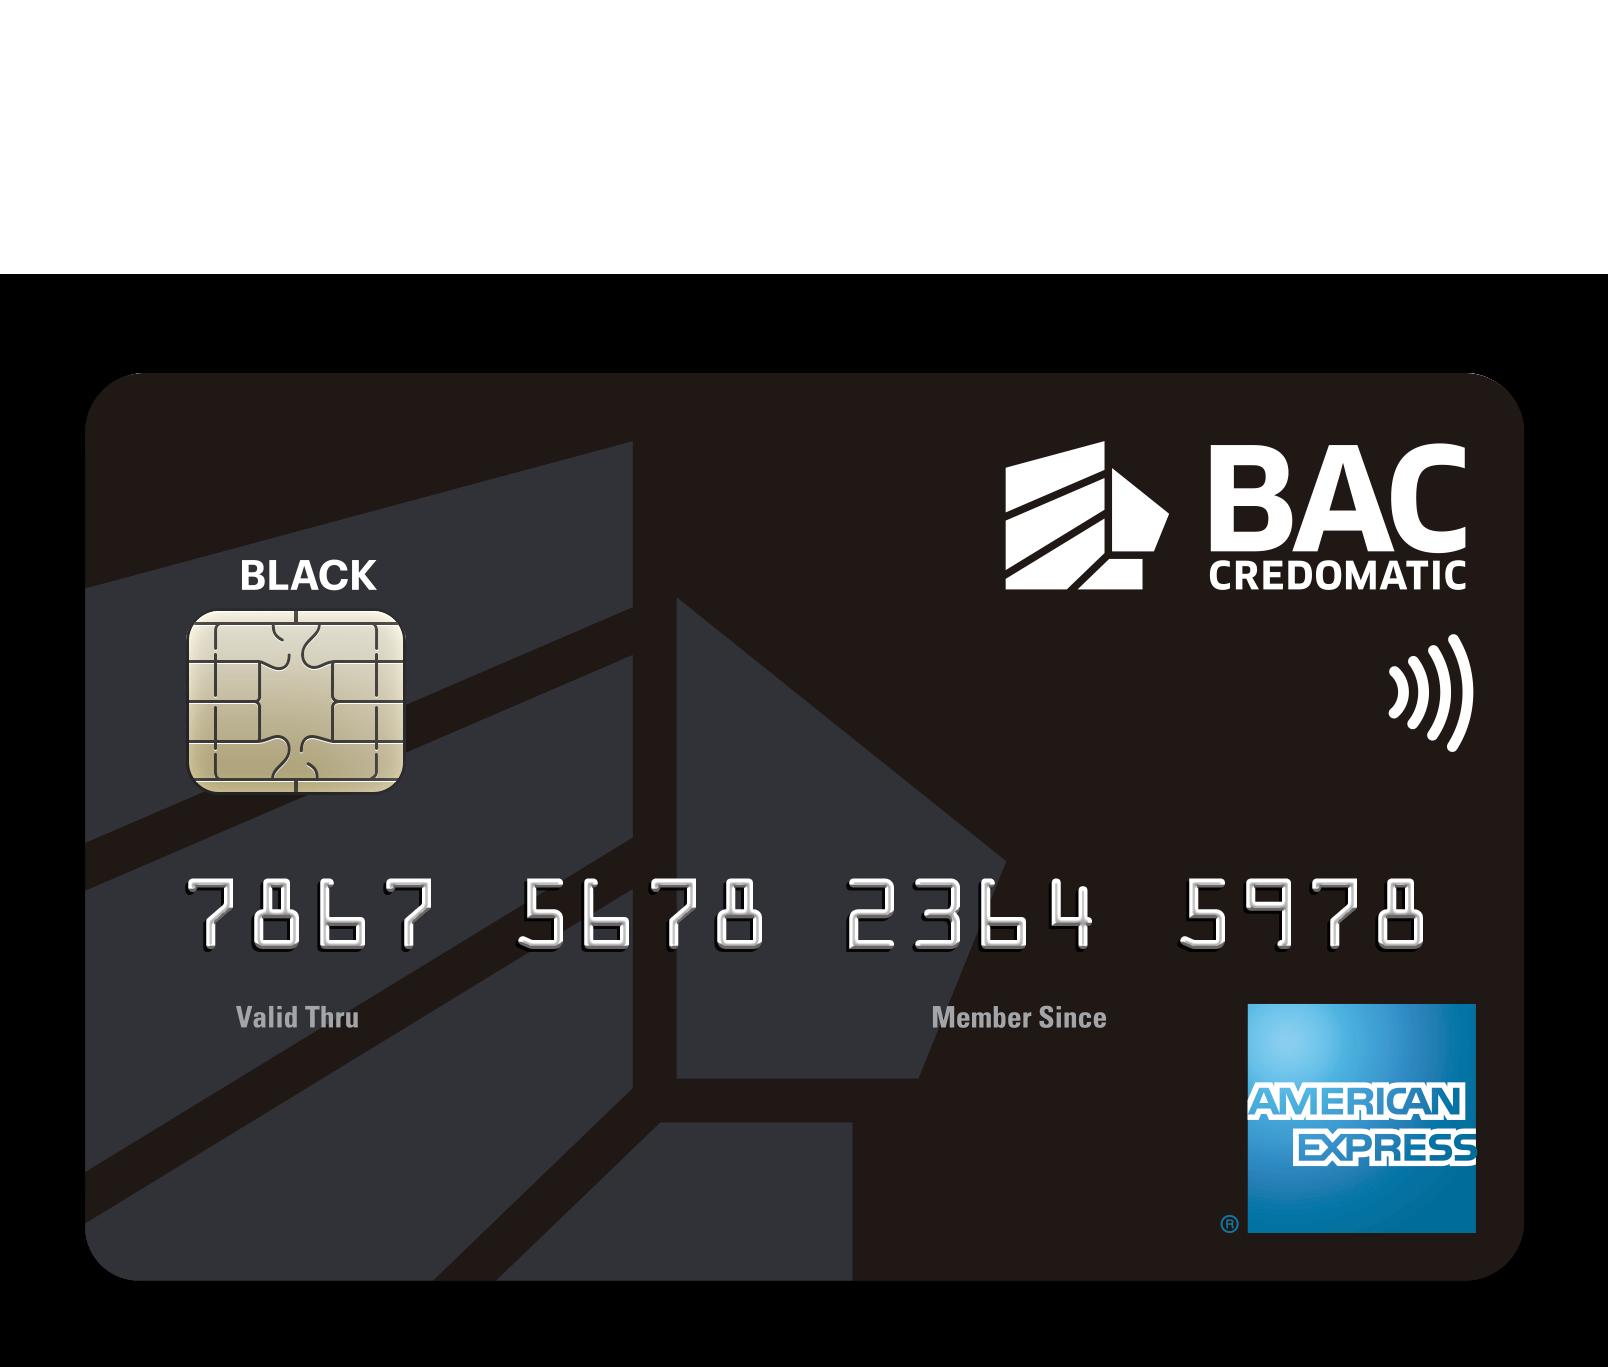 Tarjeta de Crédito American Express Black Bac Credomatic